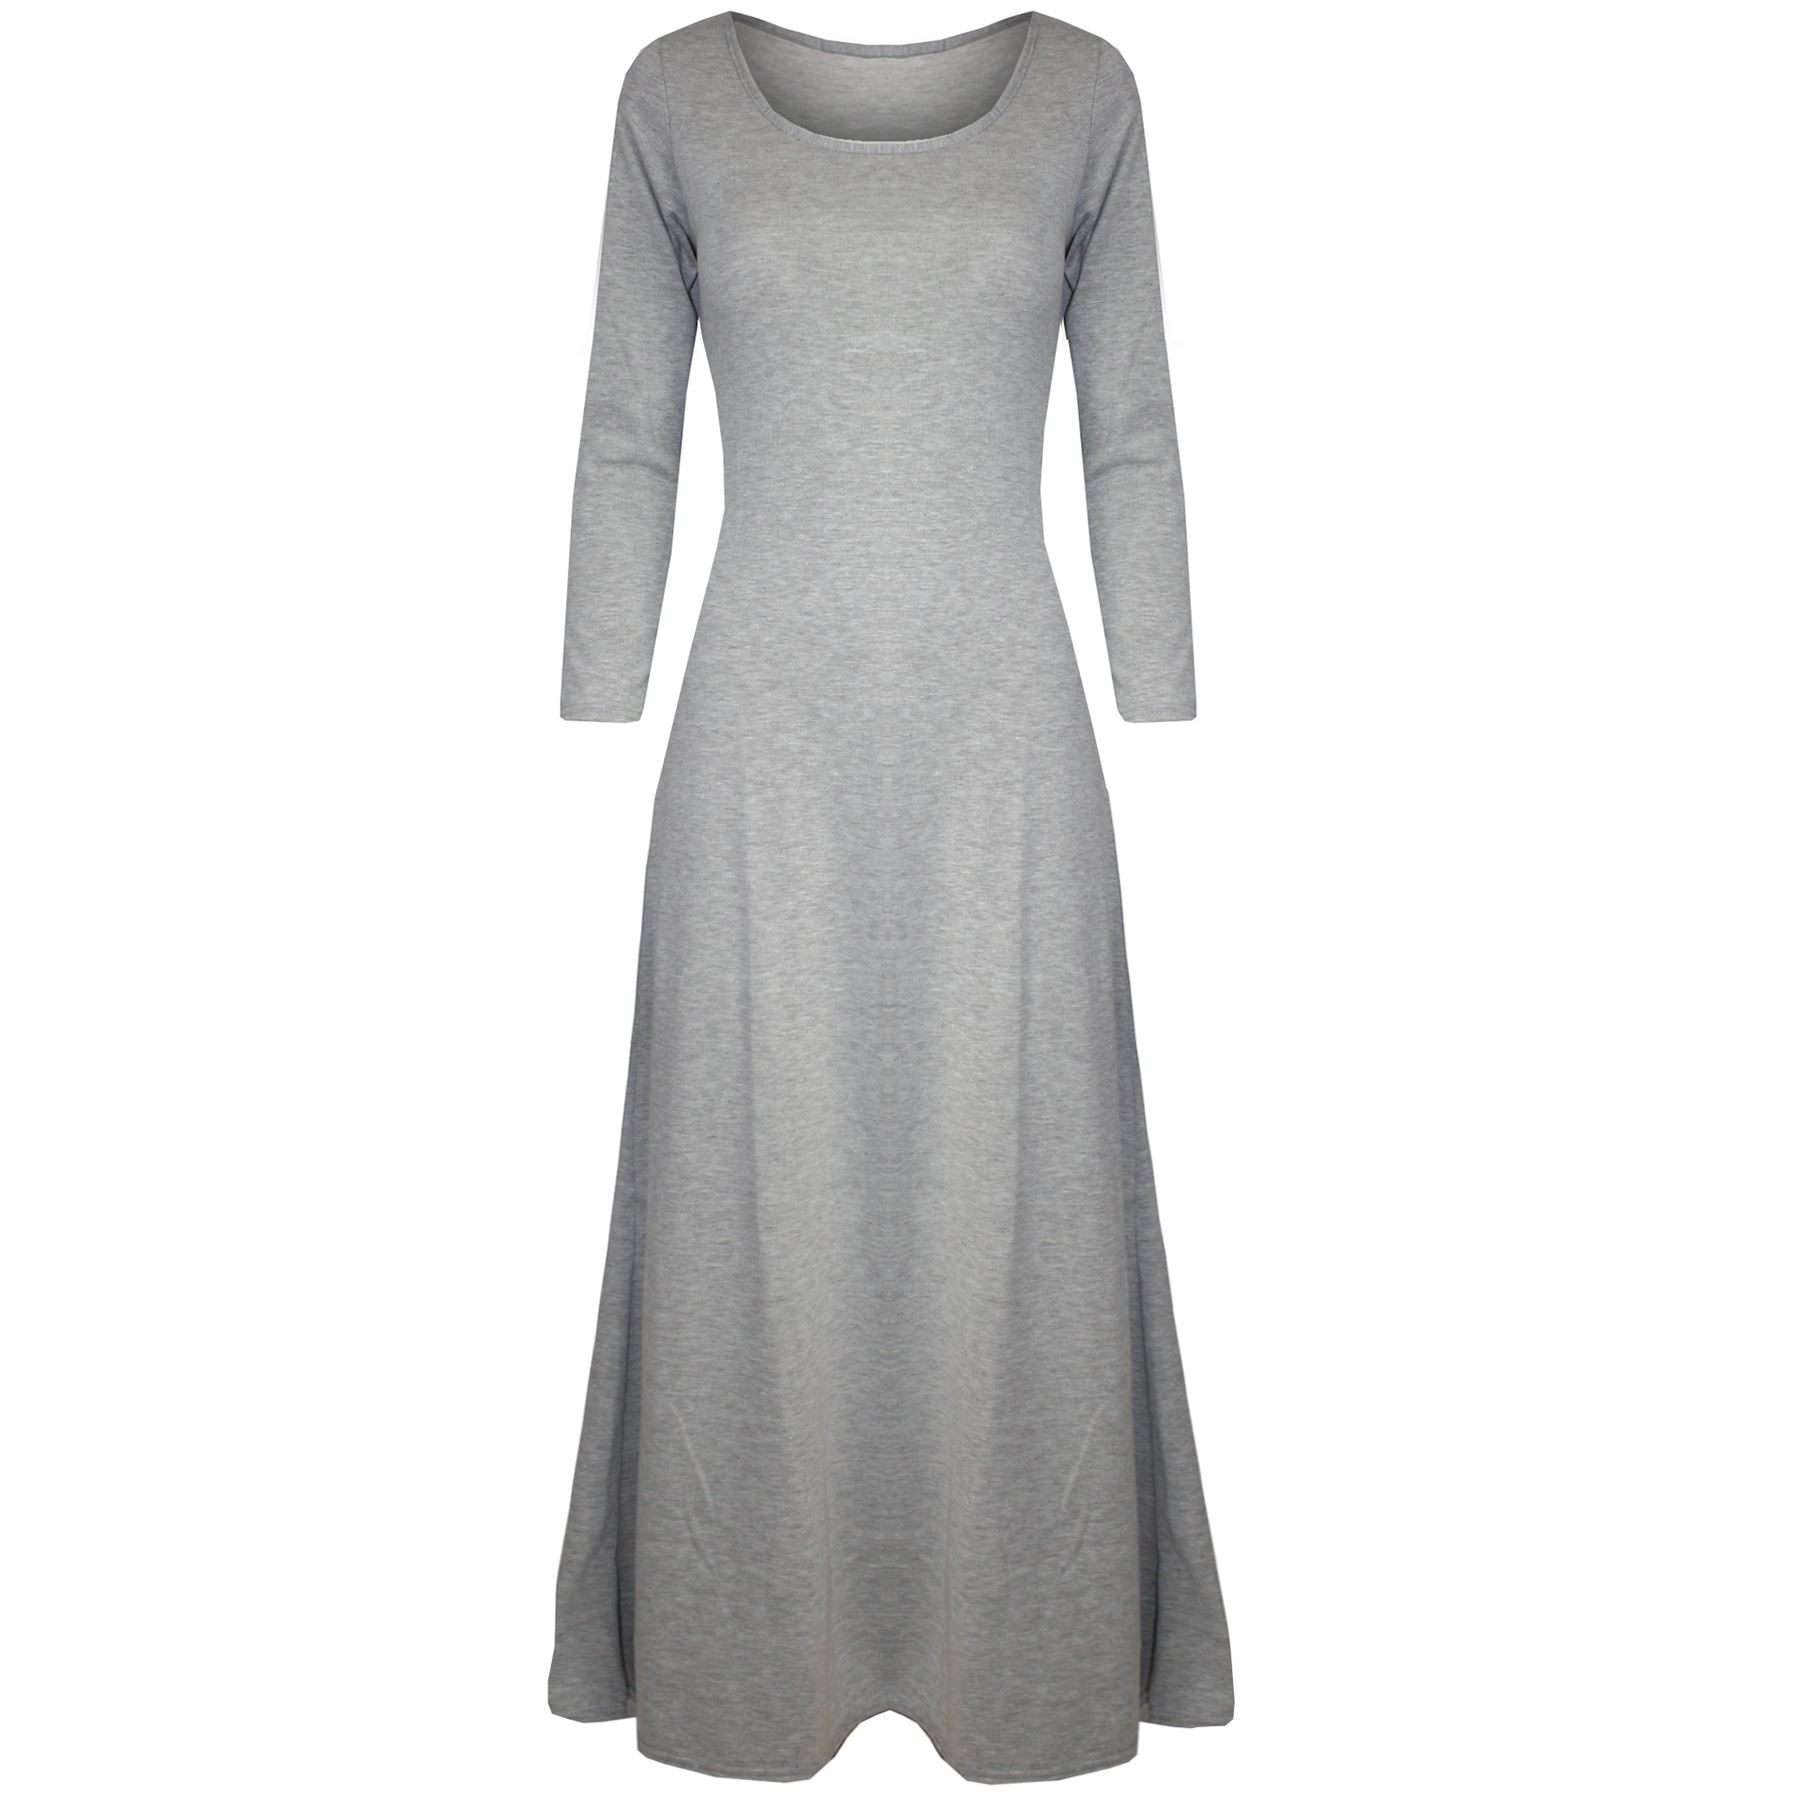 Womens Maxi Dress Ladies 3/4 Sleeve Celebrity Stretchy ...